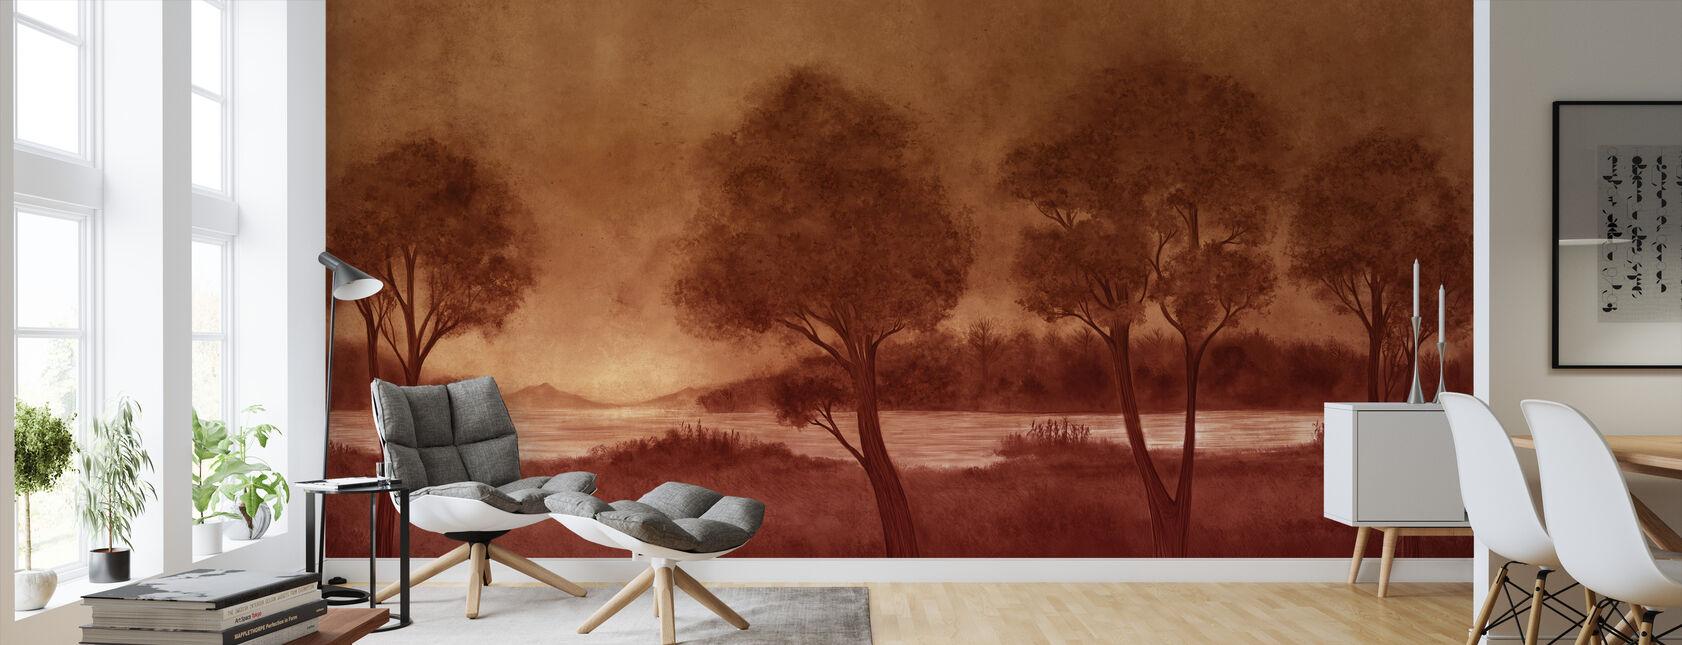 Bonny Scenery - Hazel - Wallpaper - Living Room